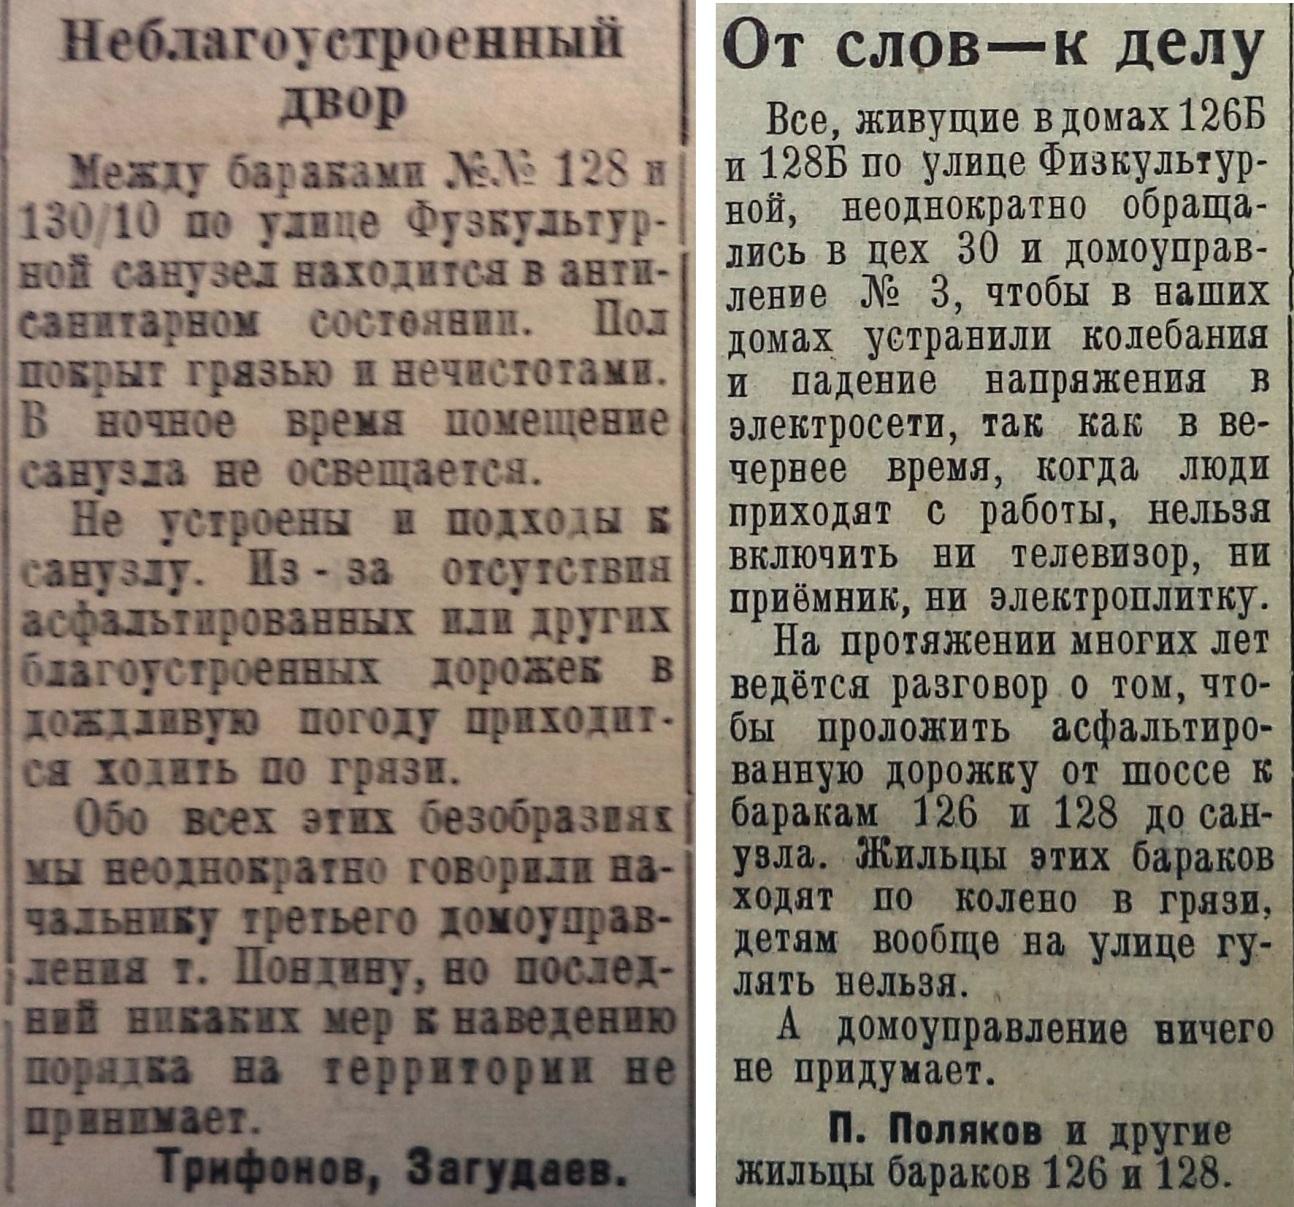 Физкультурная-ФОТО-49-За ударные темпы-1959-10 октября-Y-min